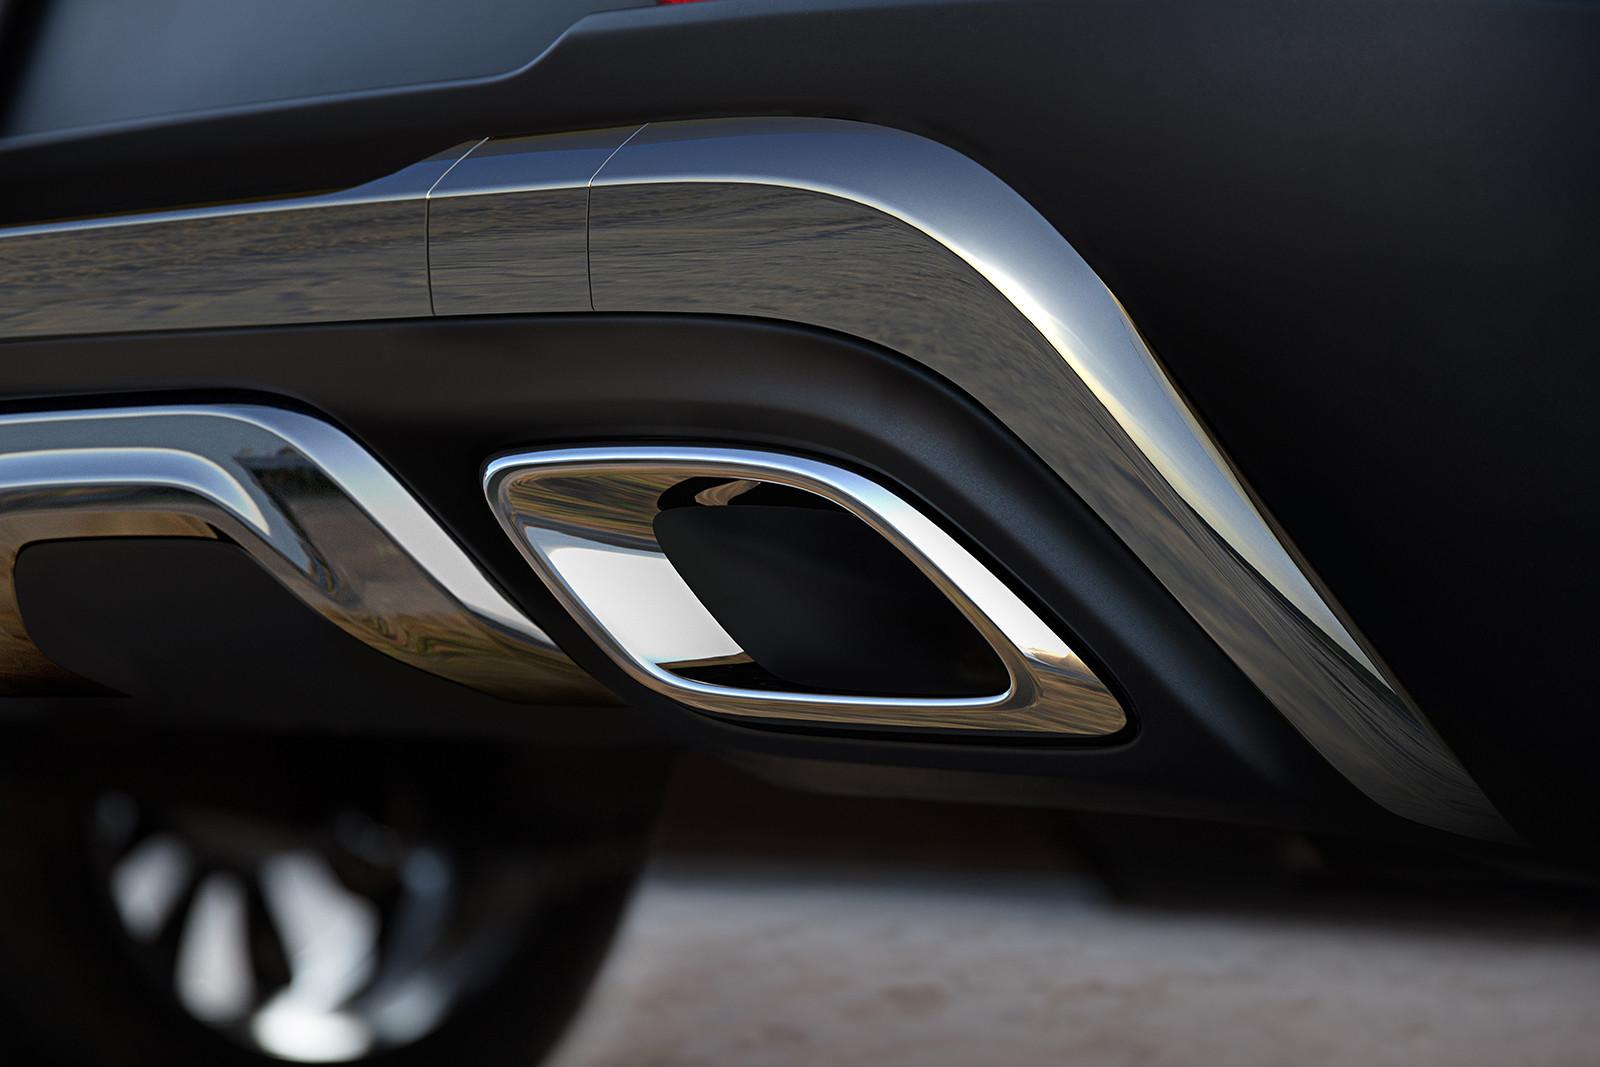 Foto de Chevrolet Trailblazer 2021 (7/26)